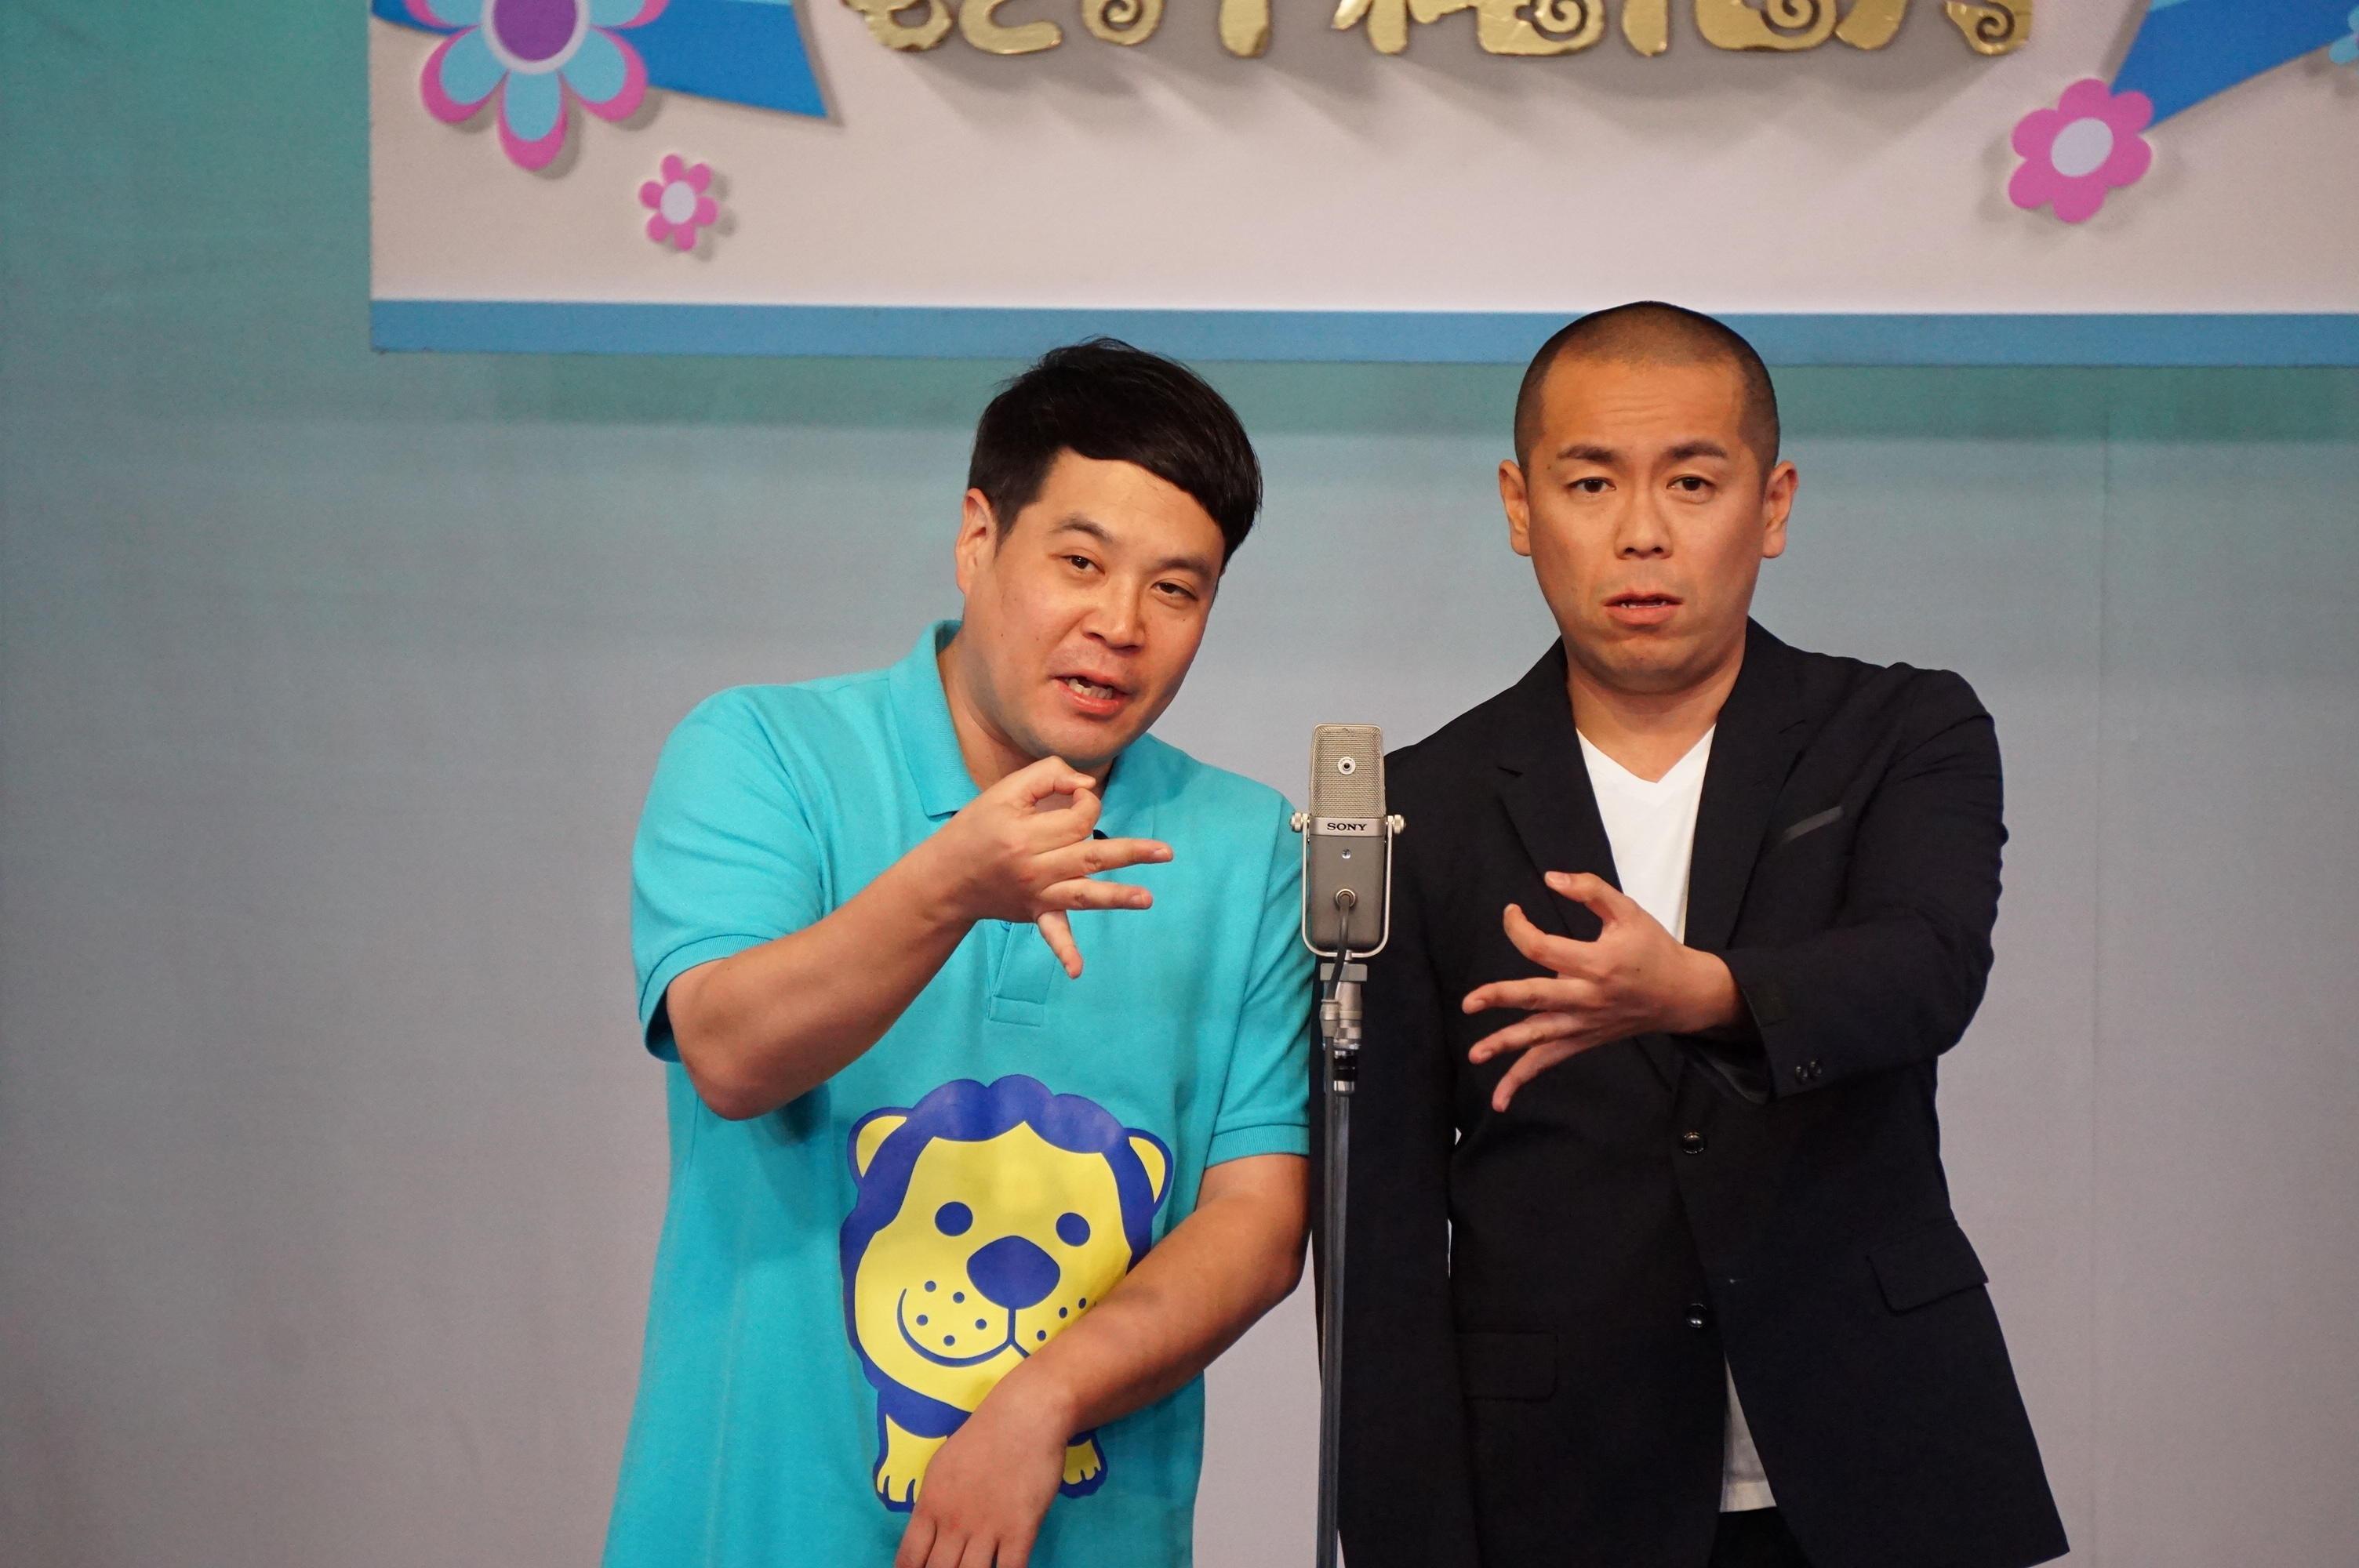 http://news.yoshimoto.co.jp/20170314201851-674bba70f5aa04662b4e47e3e0dcecc4793bf26a.jpg